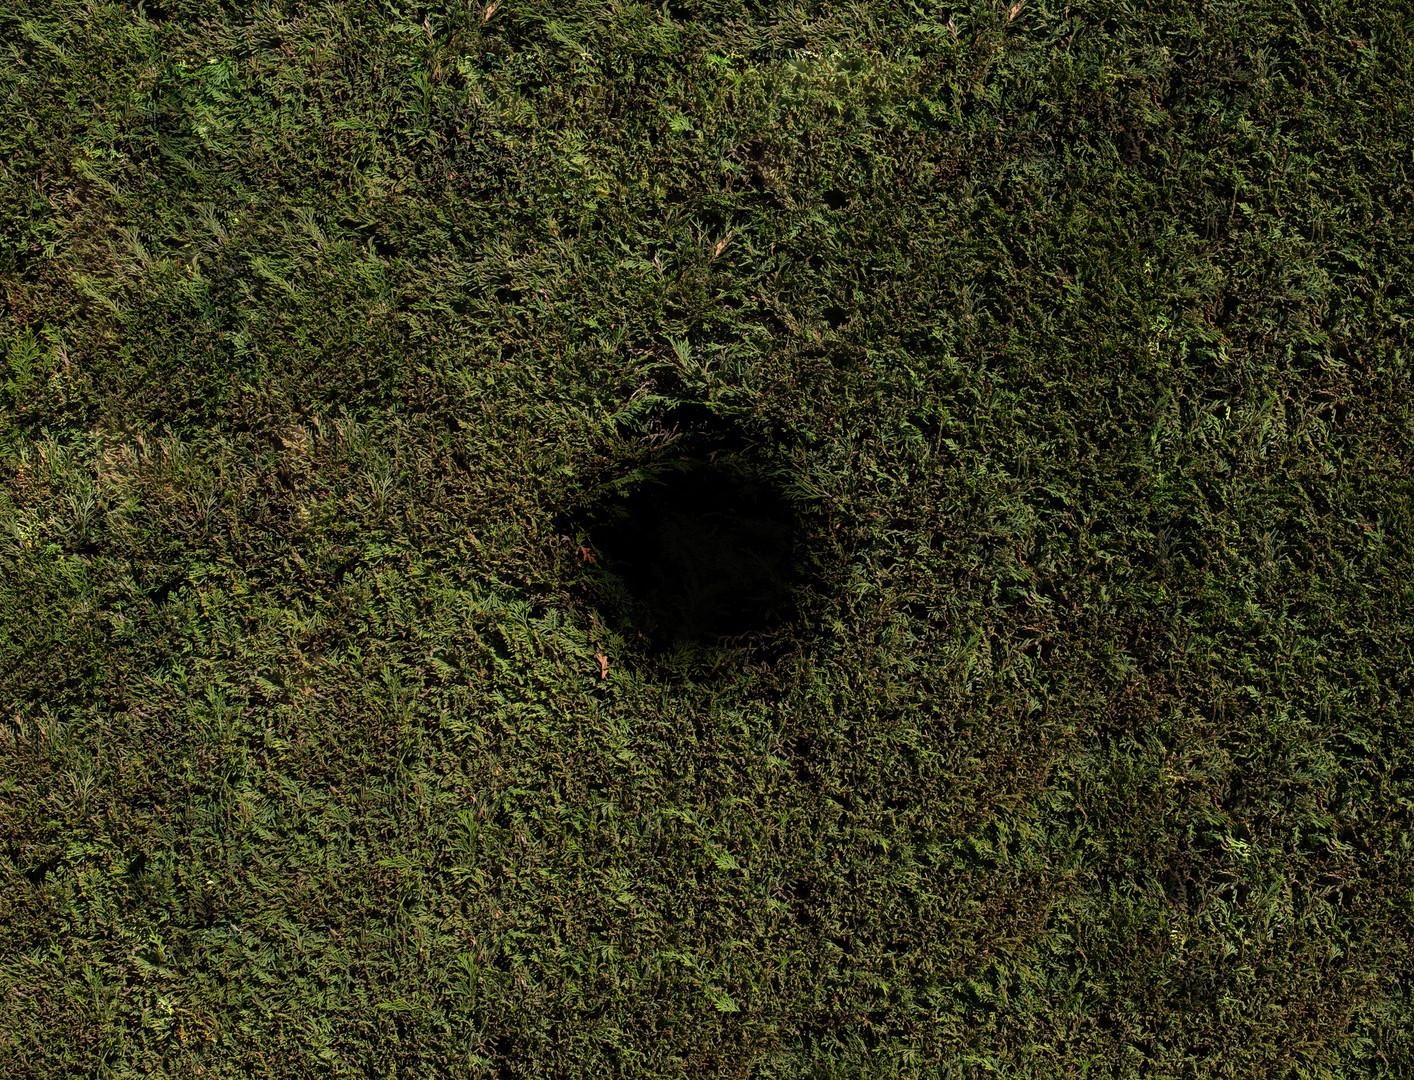 Black_Hole-2.jpg